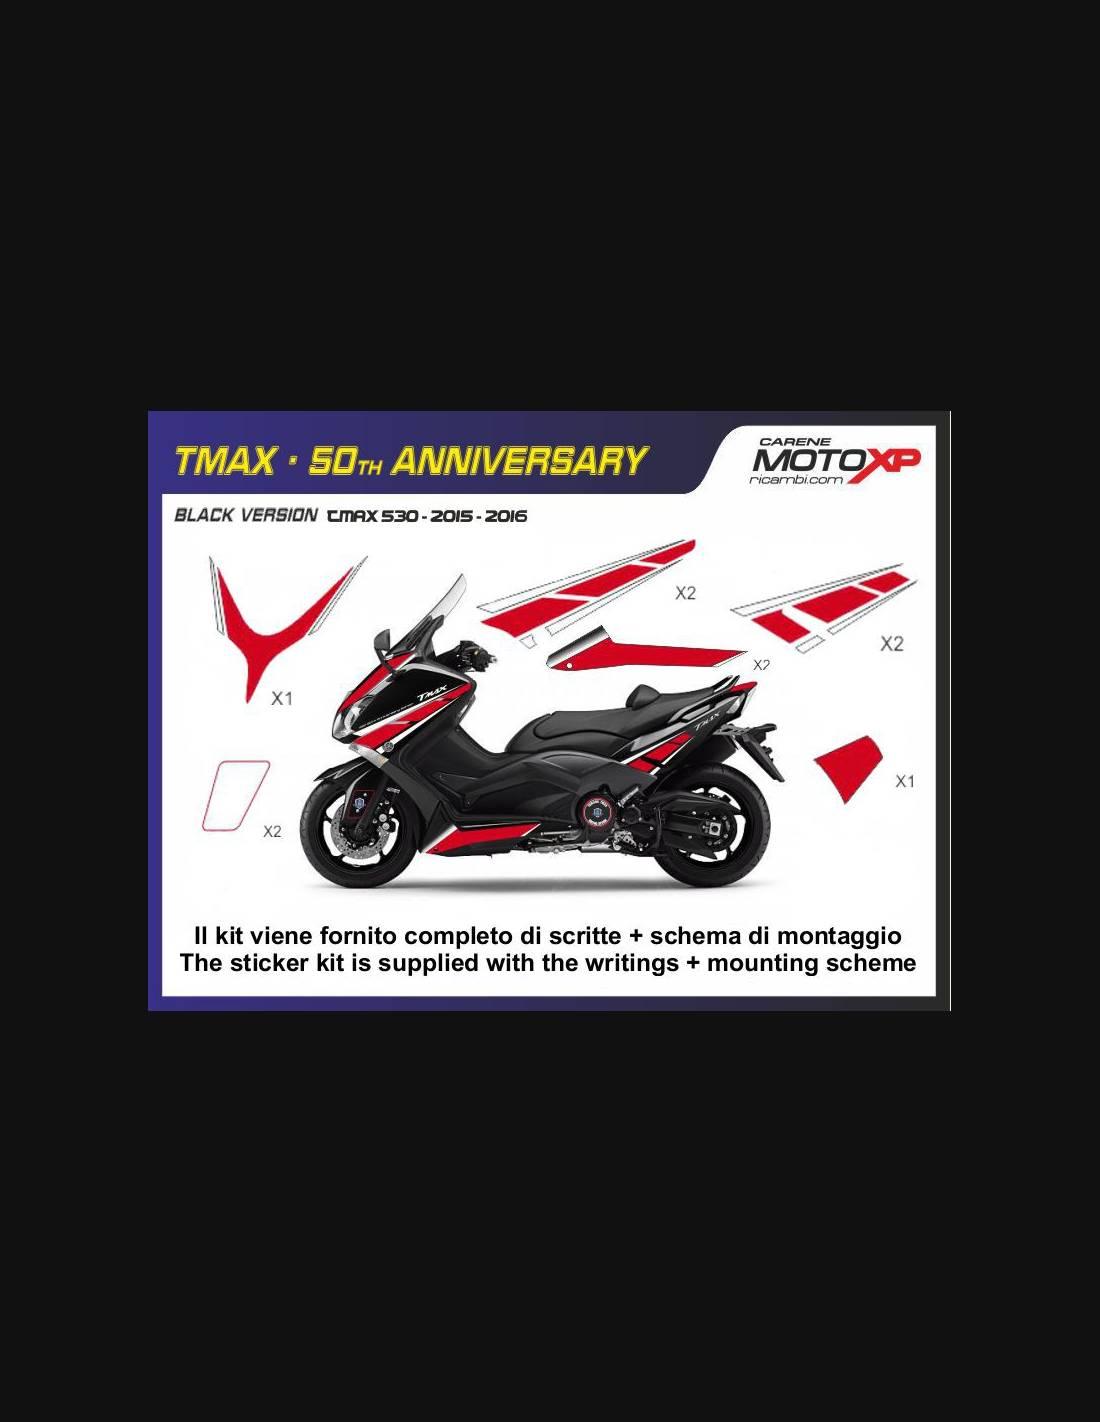 Sticker set compatible with Yamaha T Max 530 2015 - 2016 - MXPKAY6500